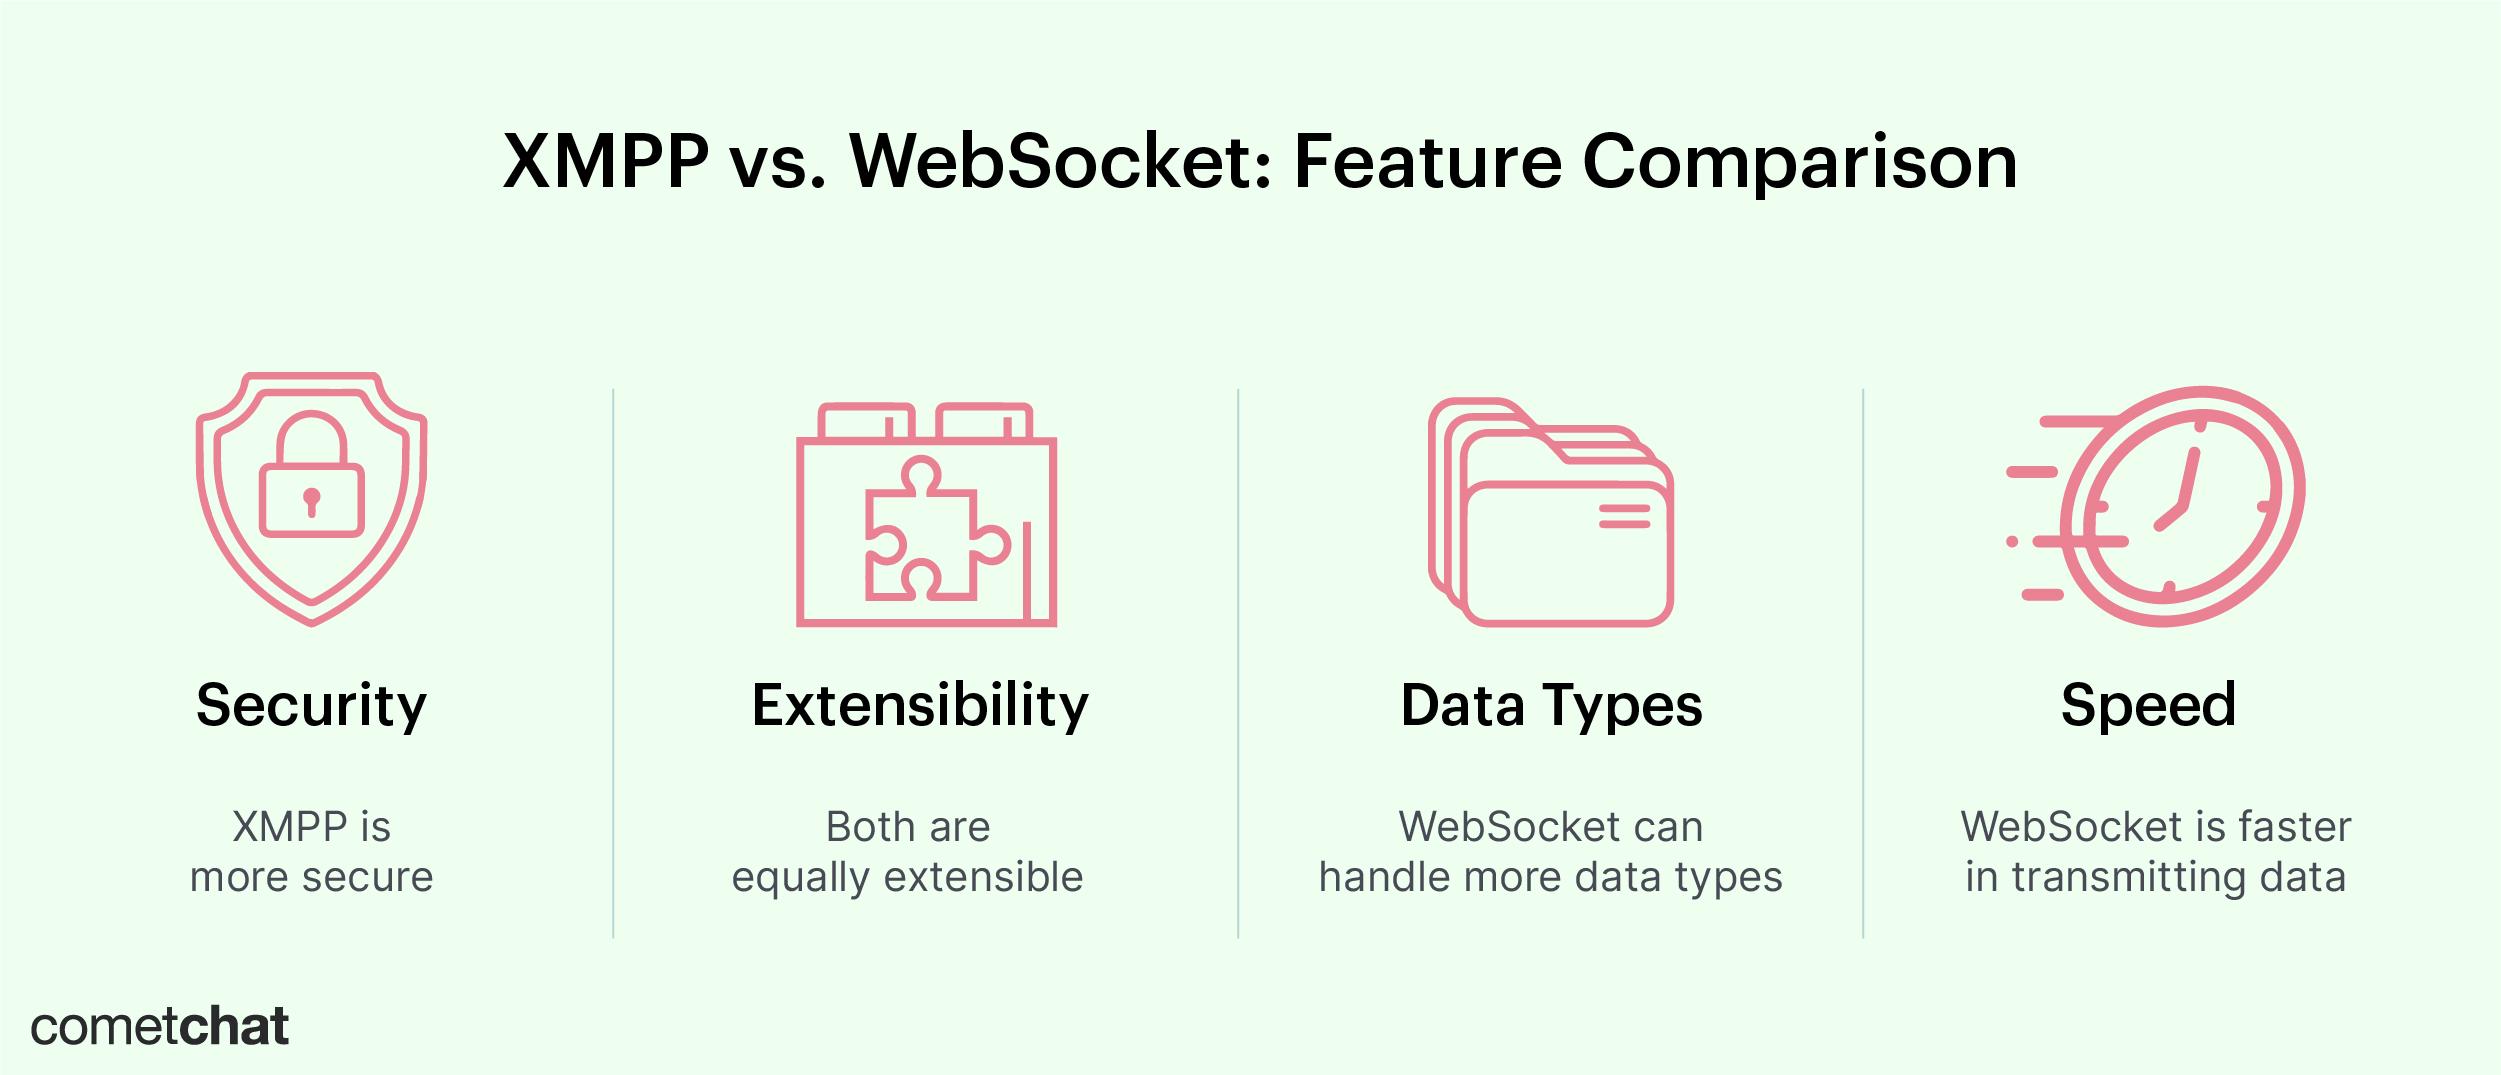 xmpp vs websocket: feature comparison